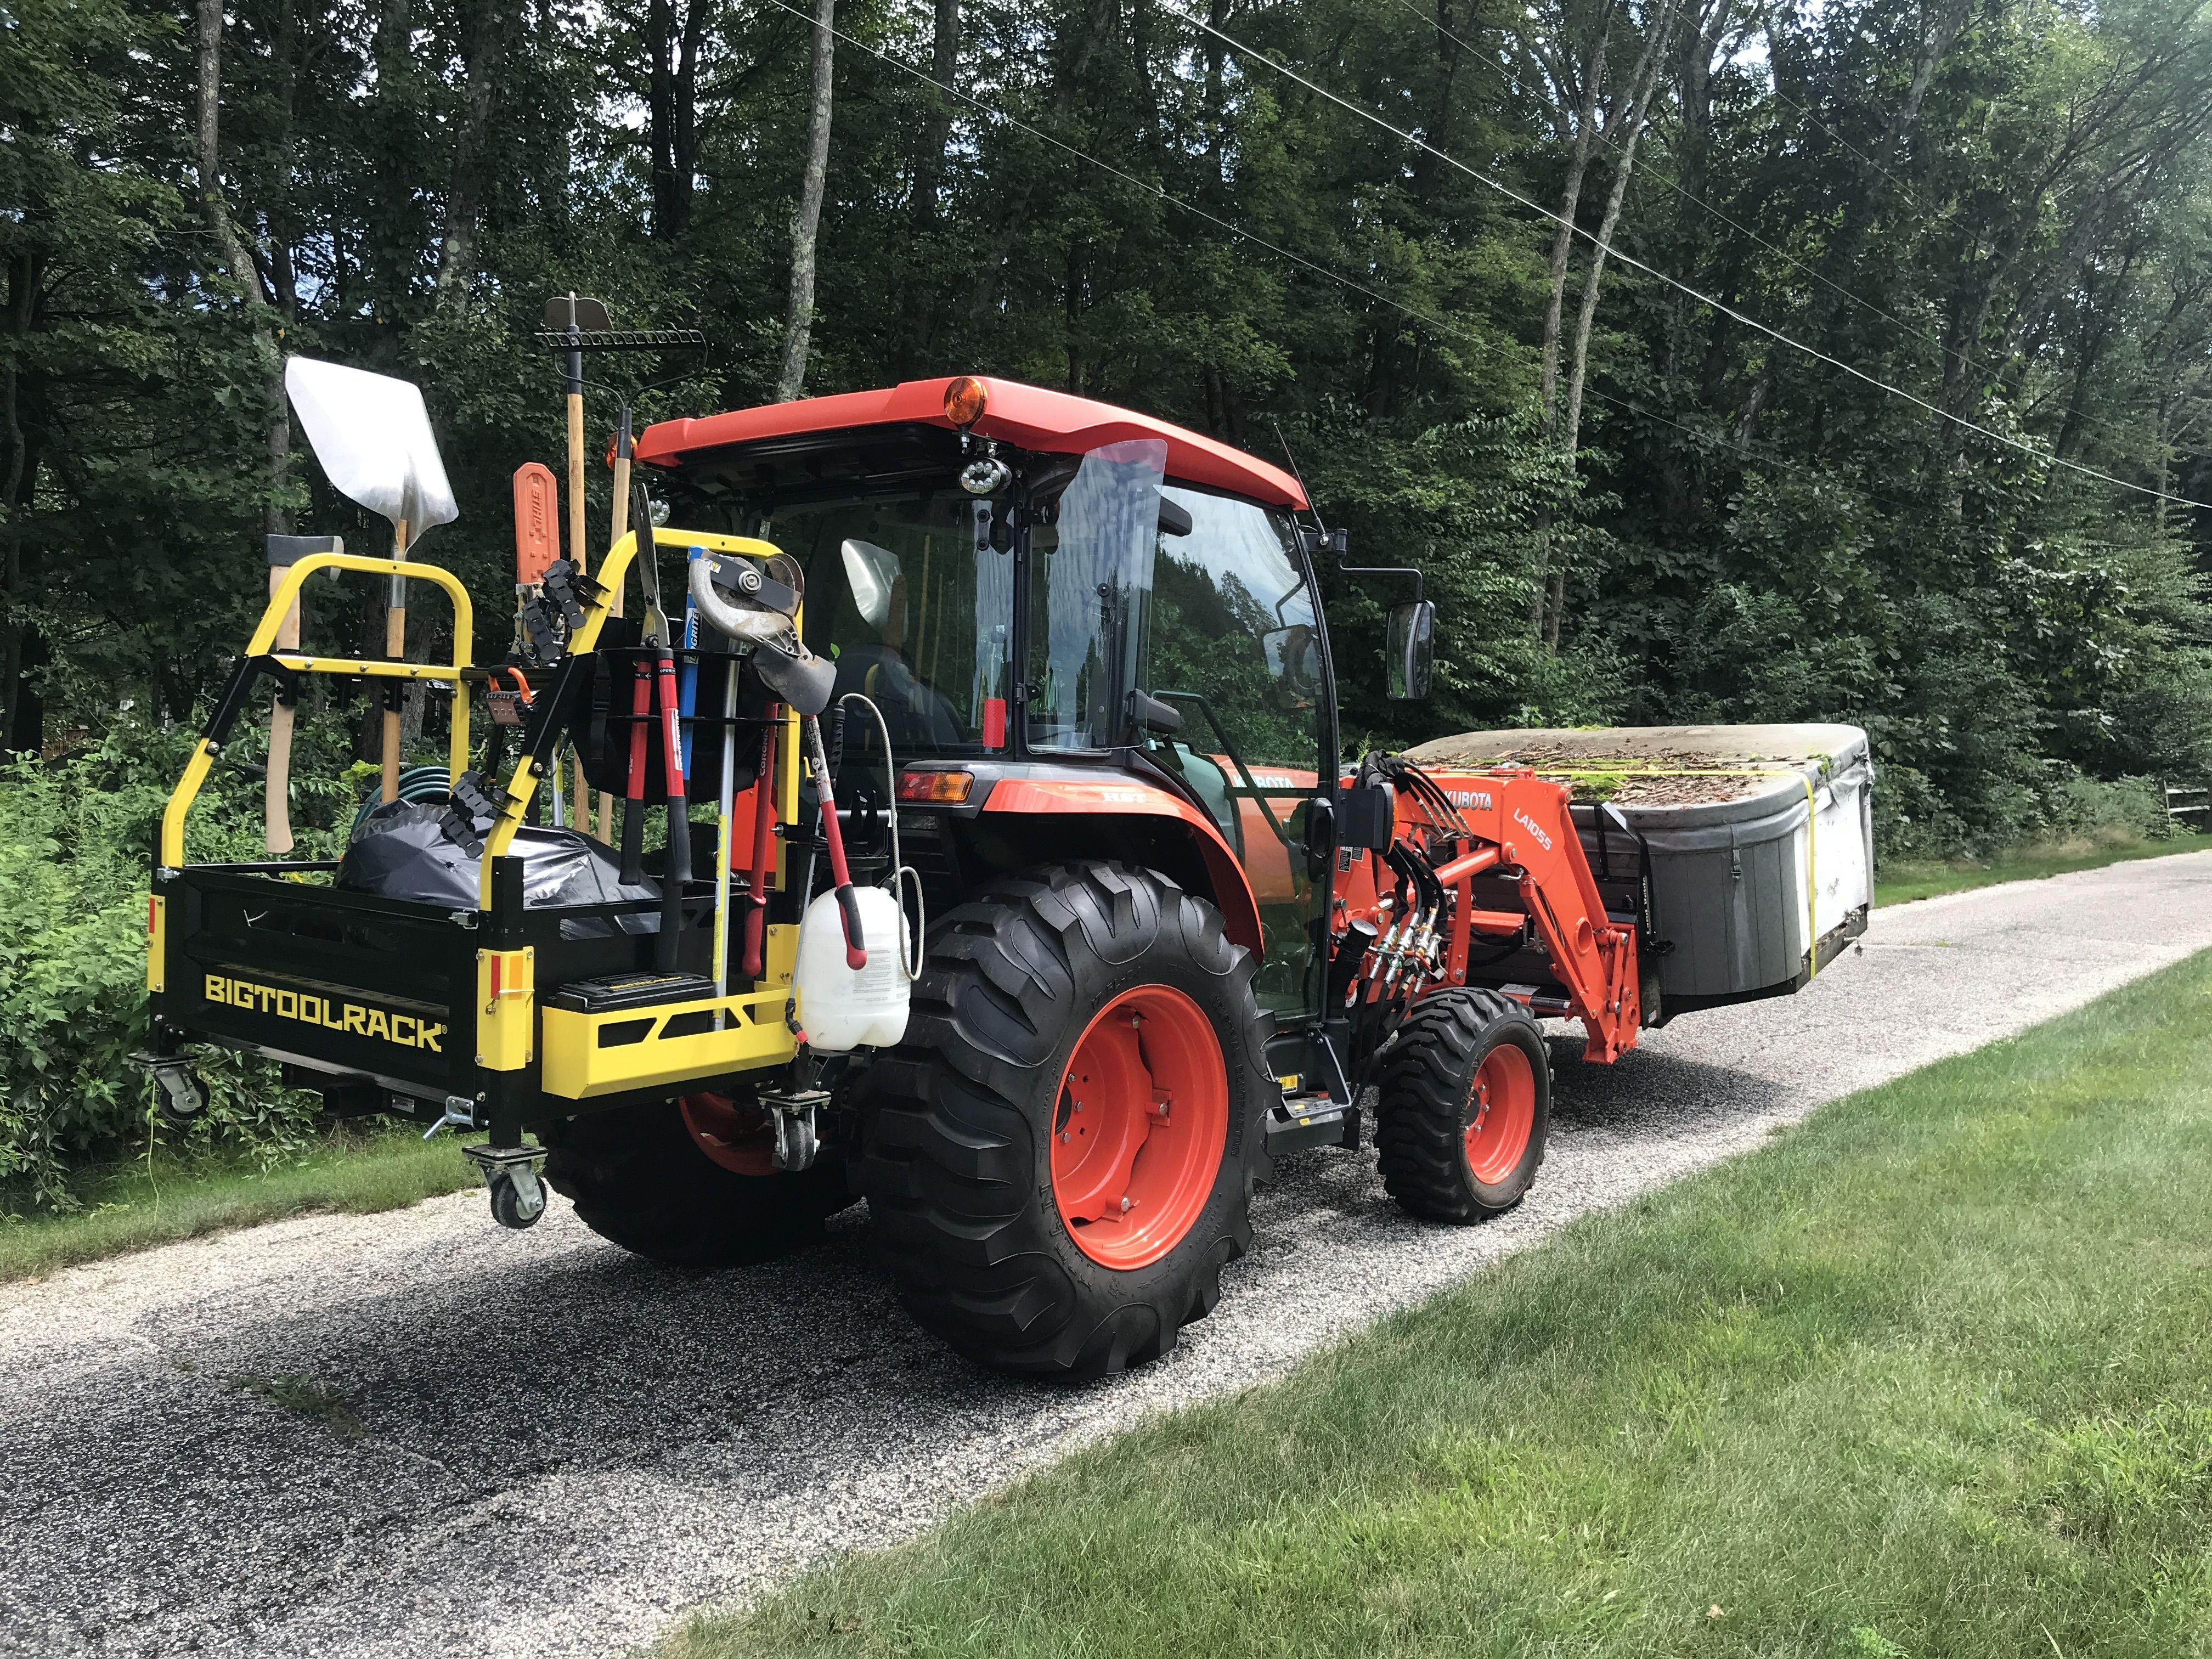 BIGTOOLRACK image by Bigtoolrack Tractor idea, Backyard